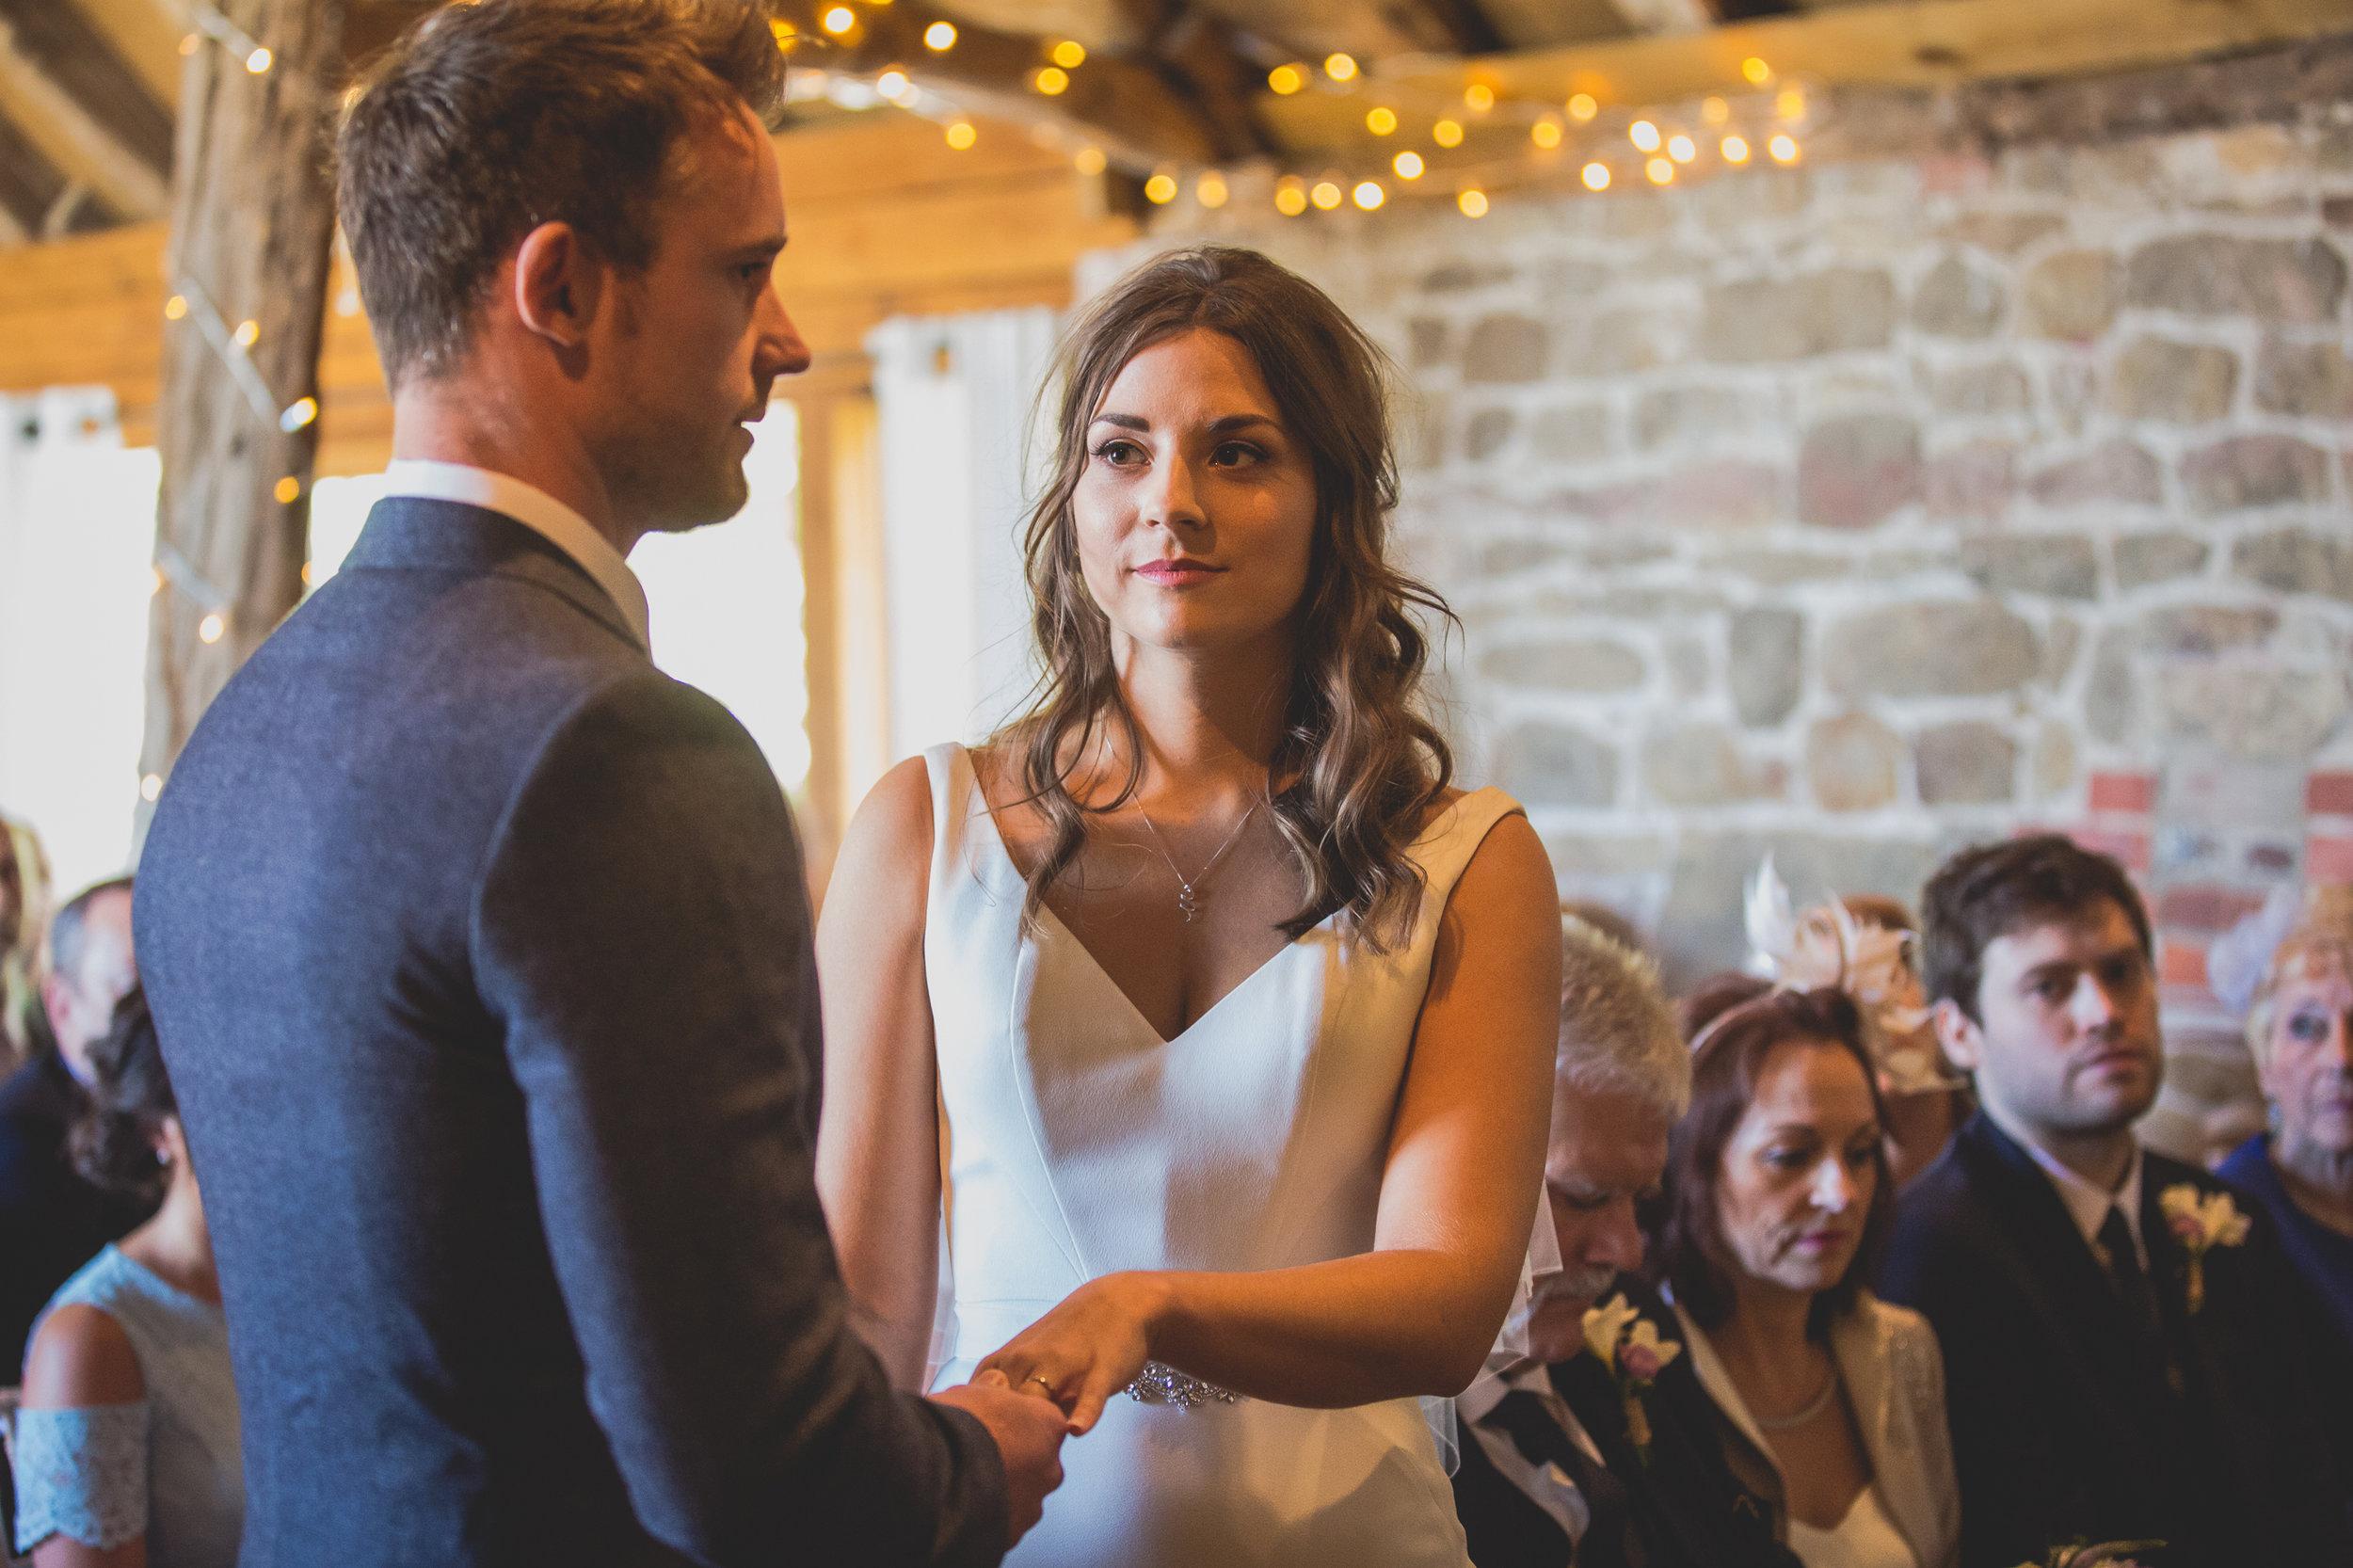 Grittenham Barn female wedding photographers west sussex petworth social-59.jpg